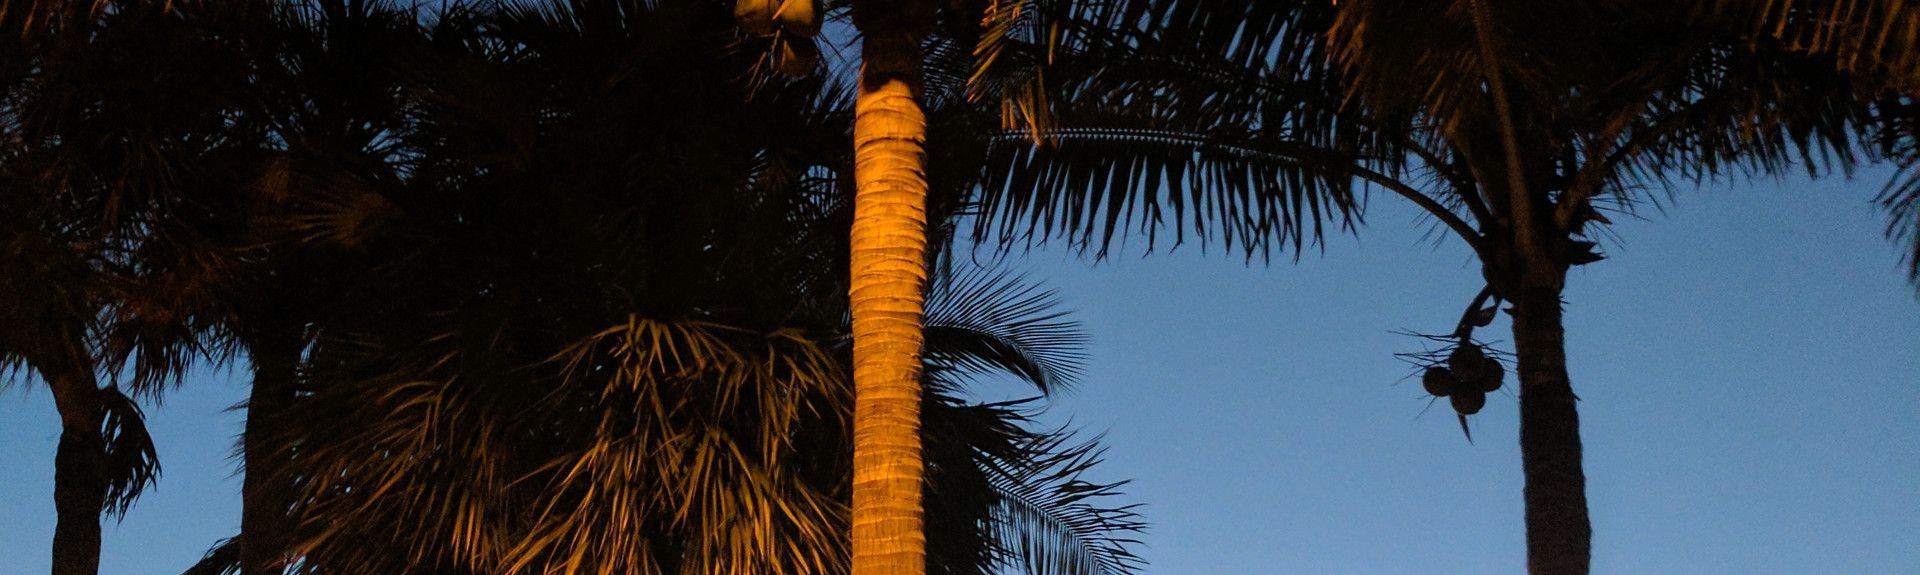 Pinecraft, Sarasota, Florida, Estados Unidos